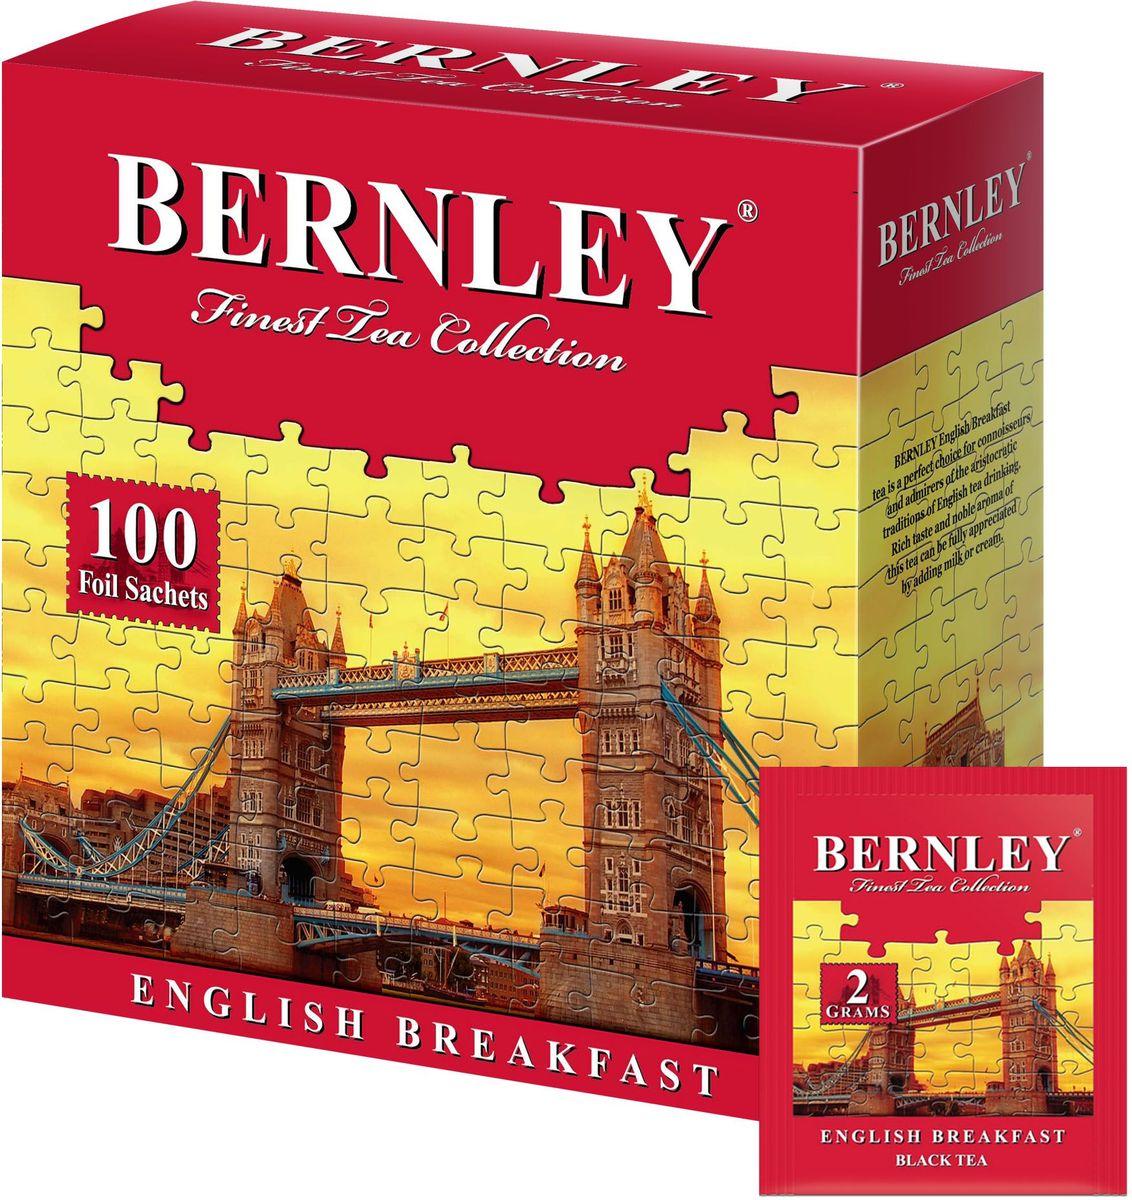 Bernley English Breakfast чай черный байховый мелкий в пакетиках, 100 шт dali 16 2 3а